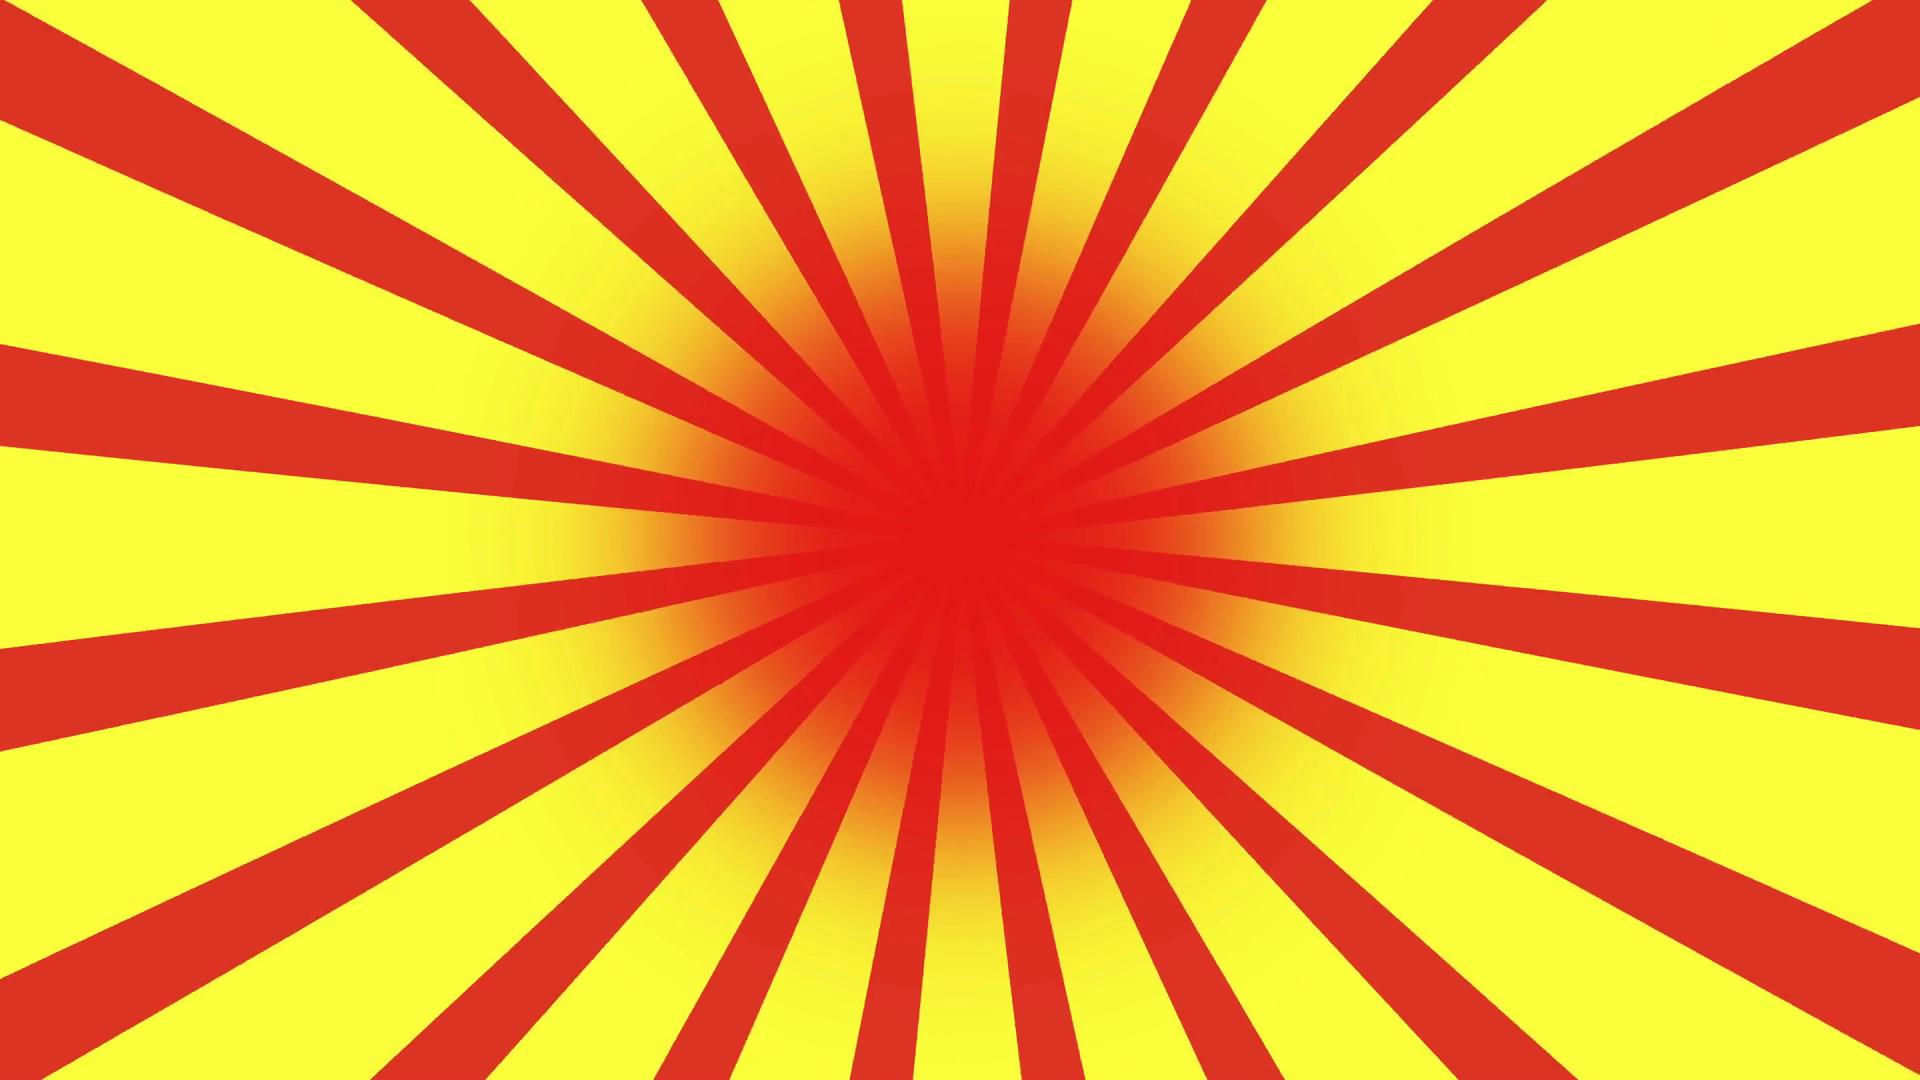 1920x1080 Red And Yellow Burst Vector Background. Cartoon Sun Light Yellow